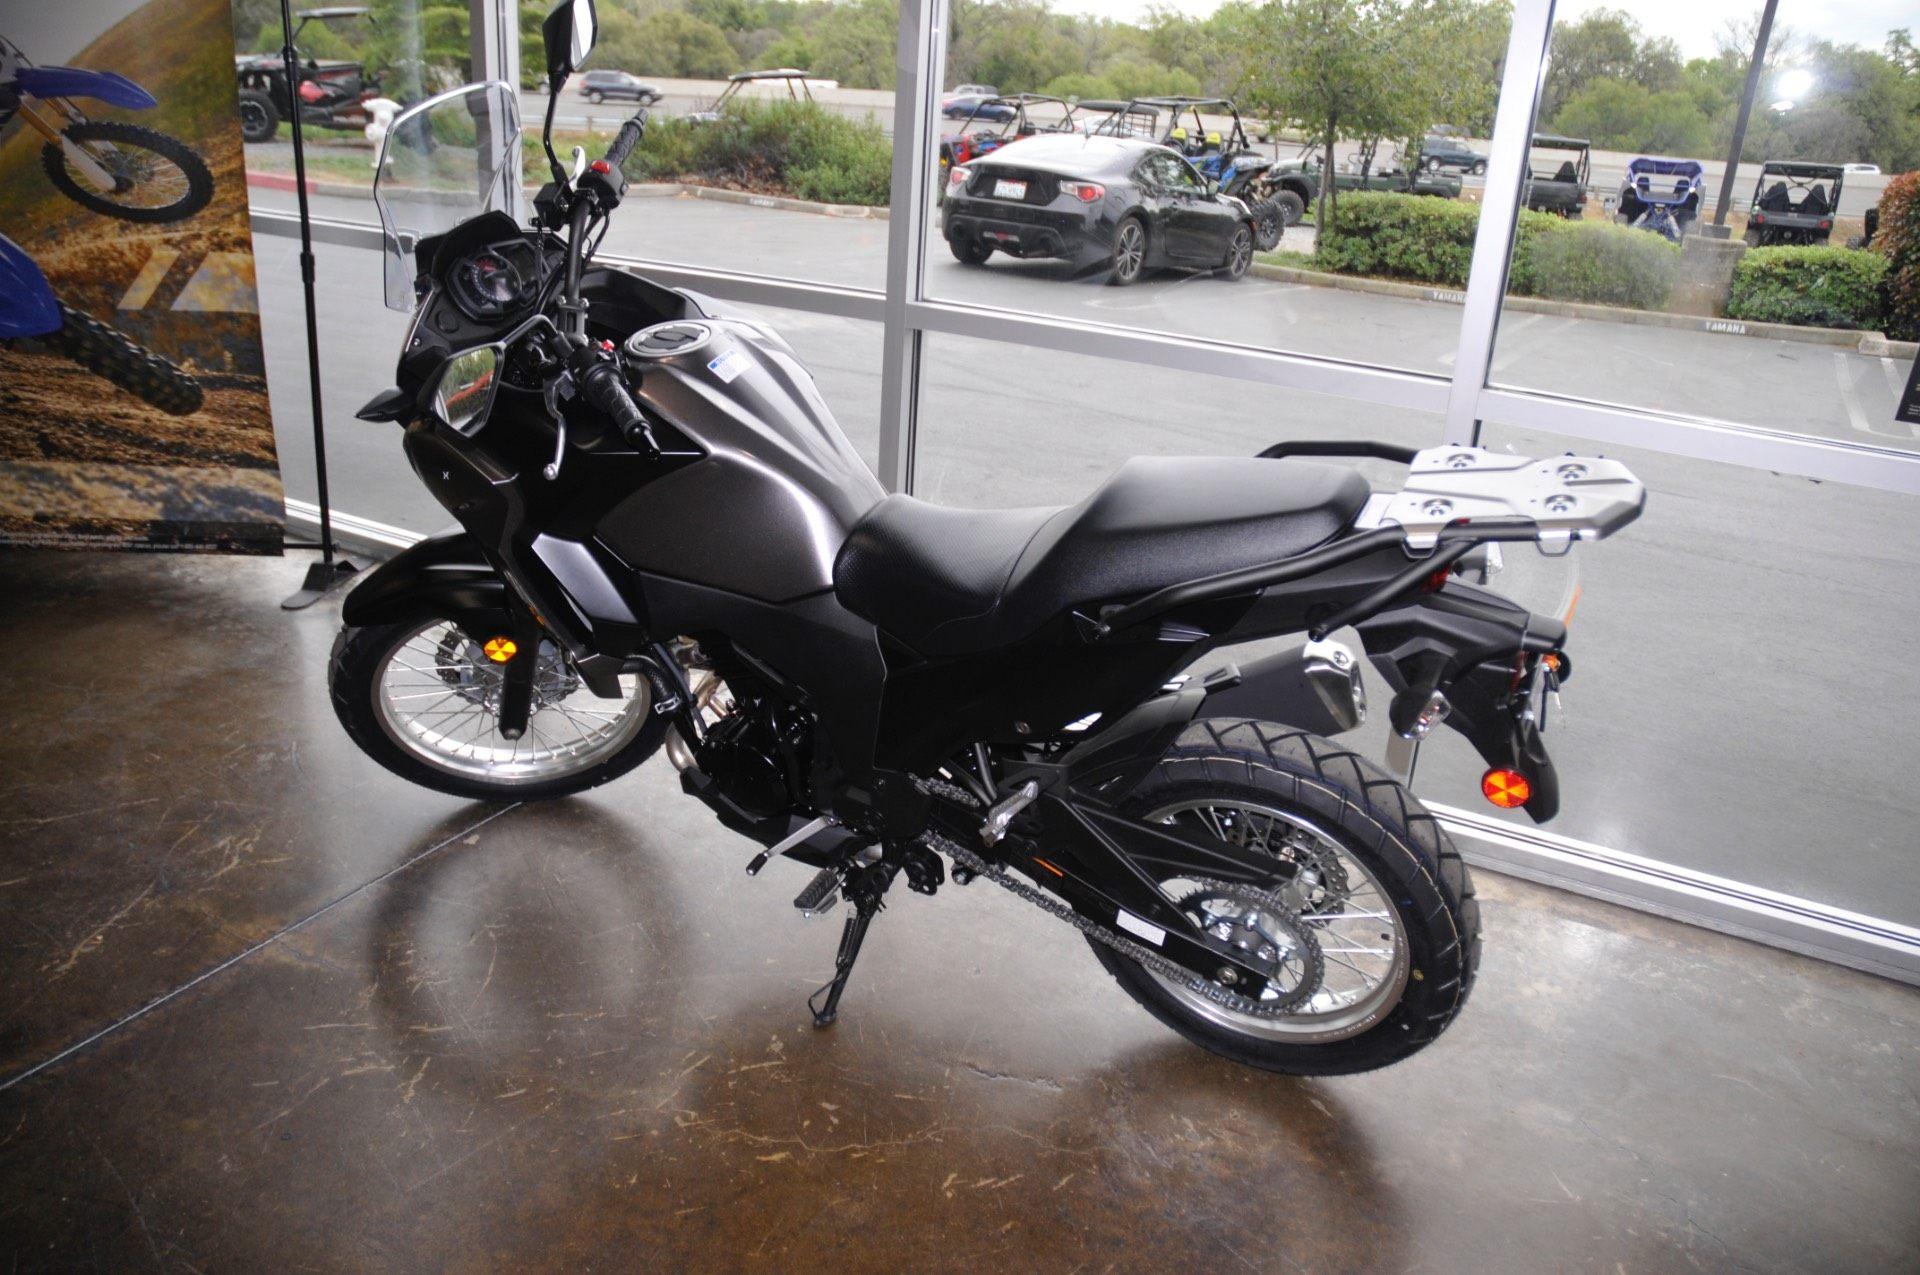 2017 Kawasaki Versys-X 300 ABS in Roseville, California